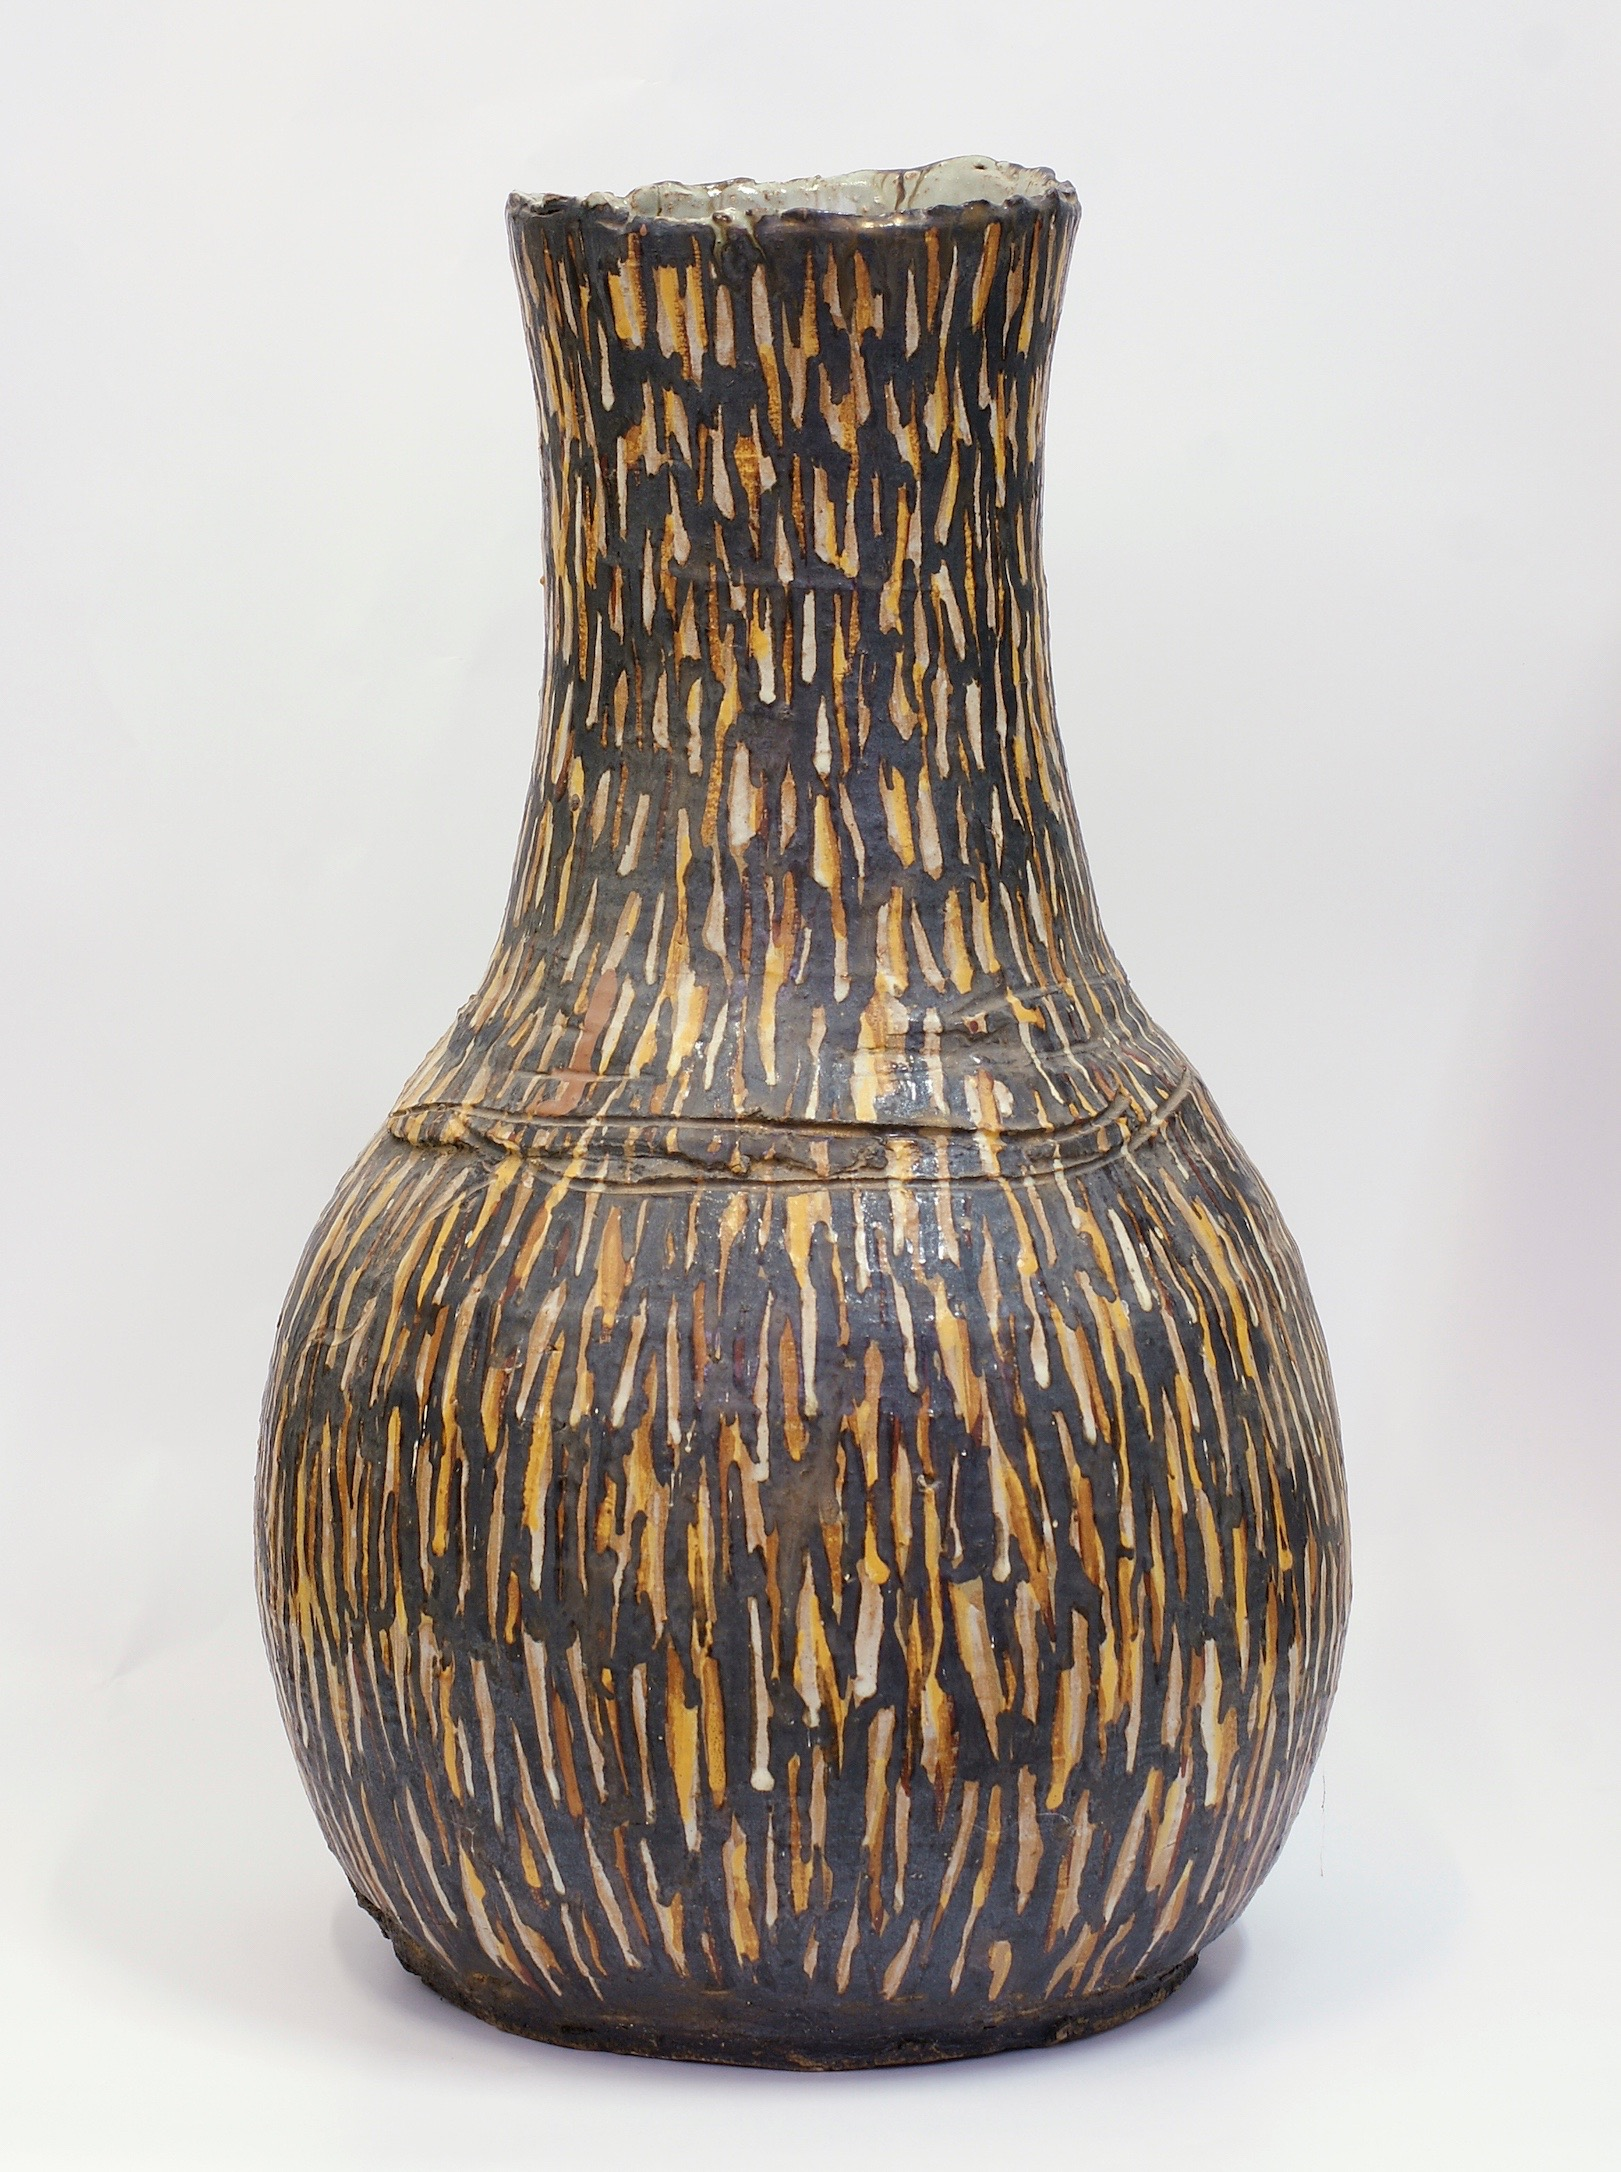 Milton Moon, Vase Form, stoneware, h51cm, 1989. Photo courtesy of Aptos Cruz Galleries.jpg